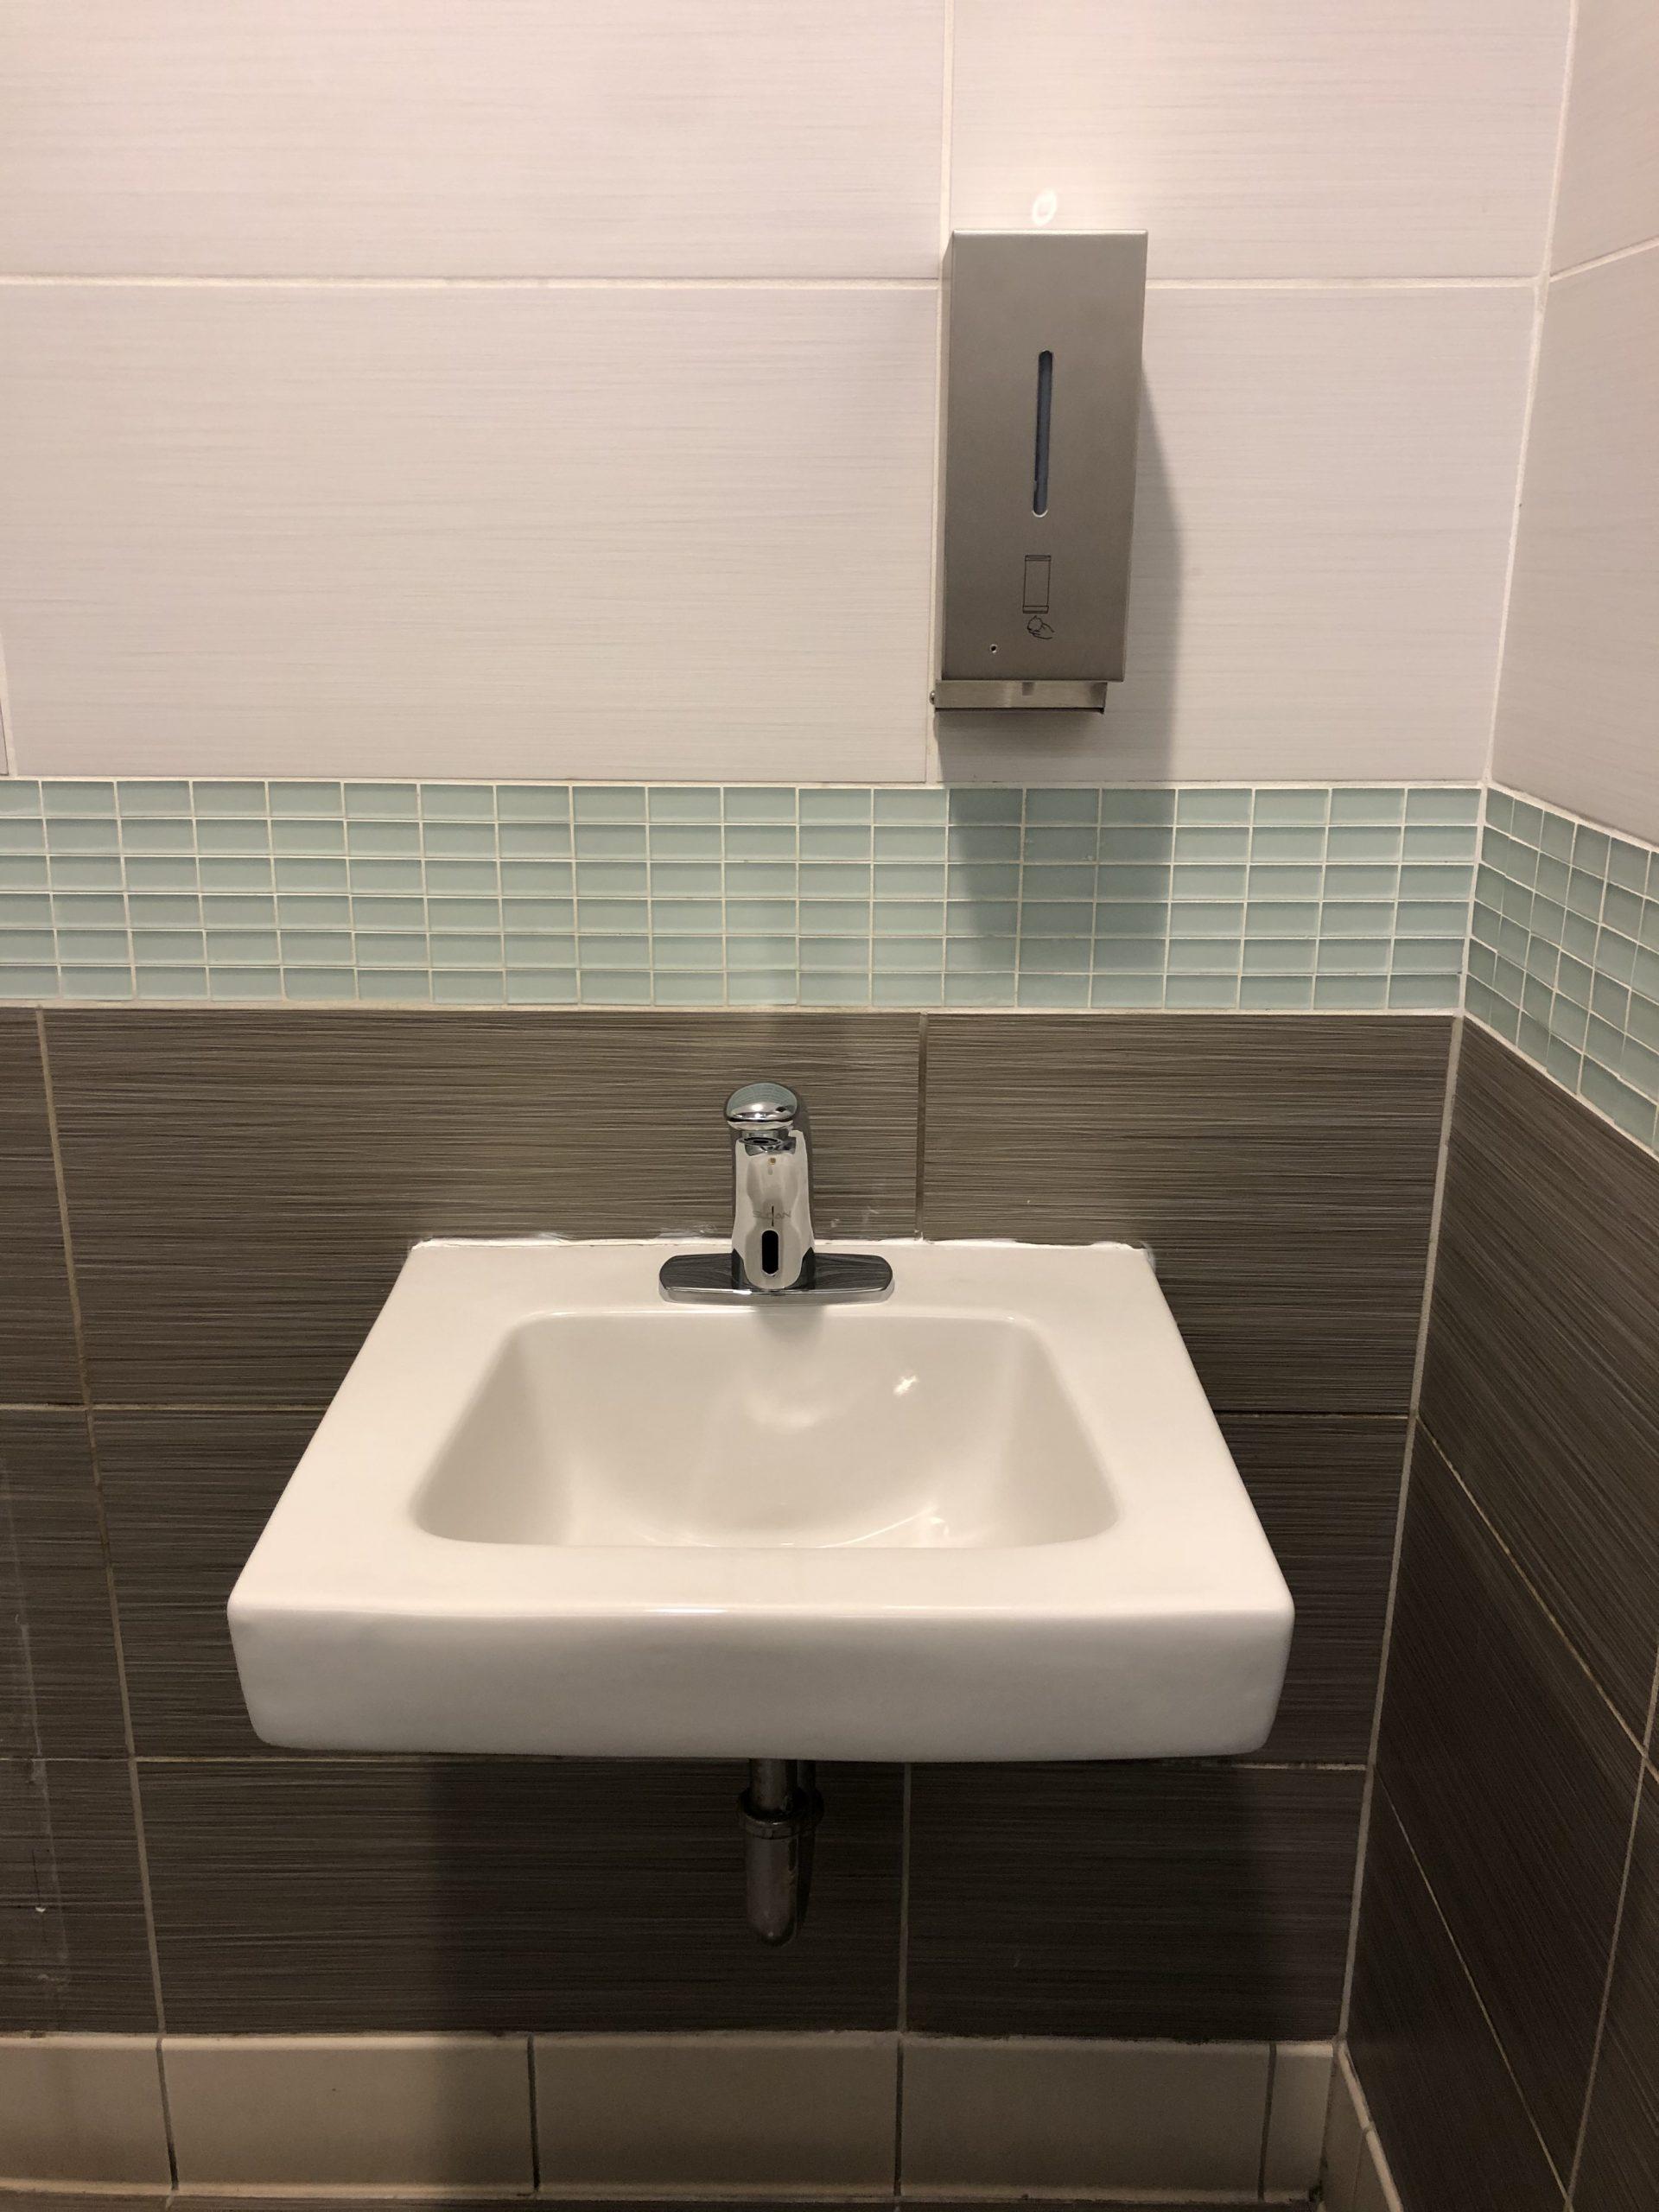 commercial bathroom fixture